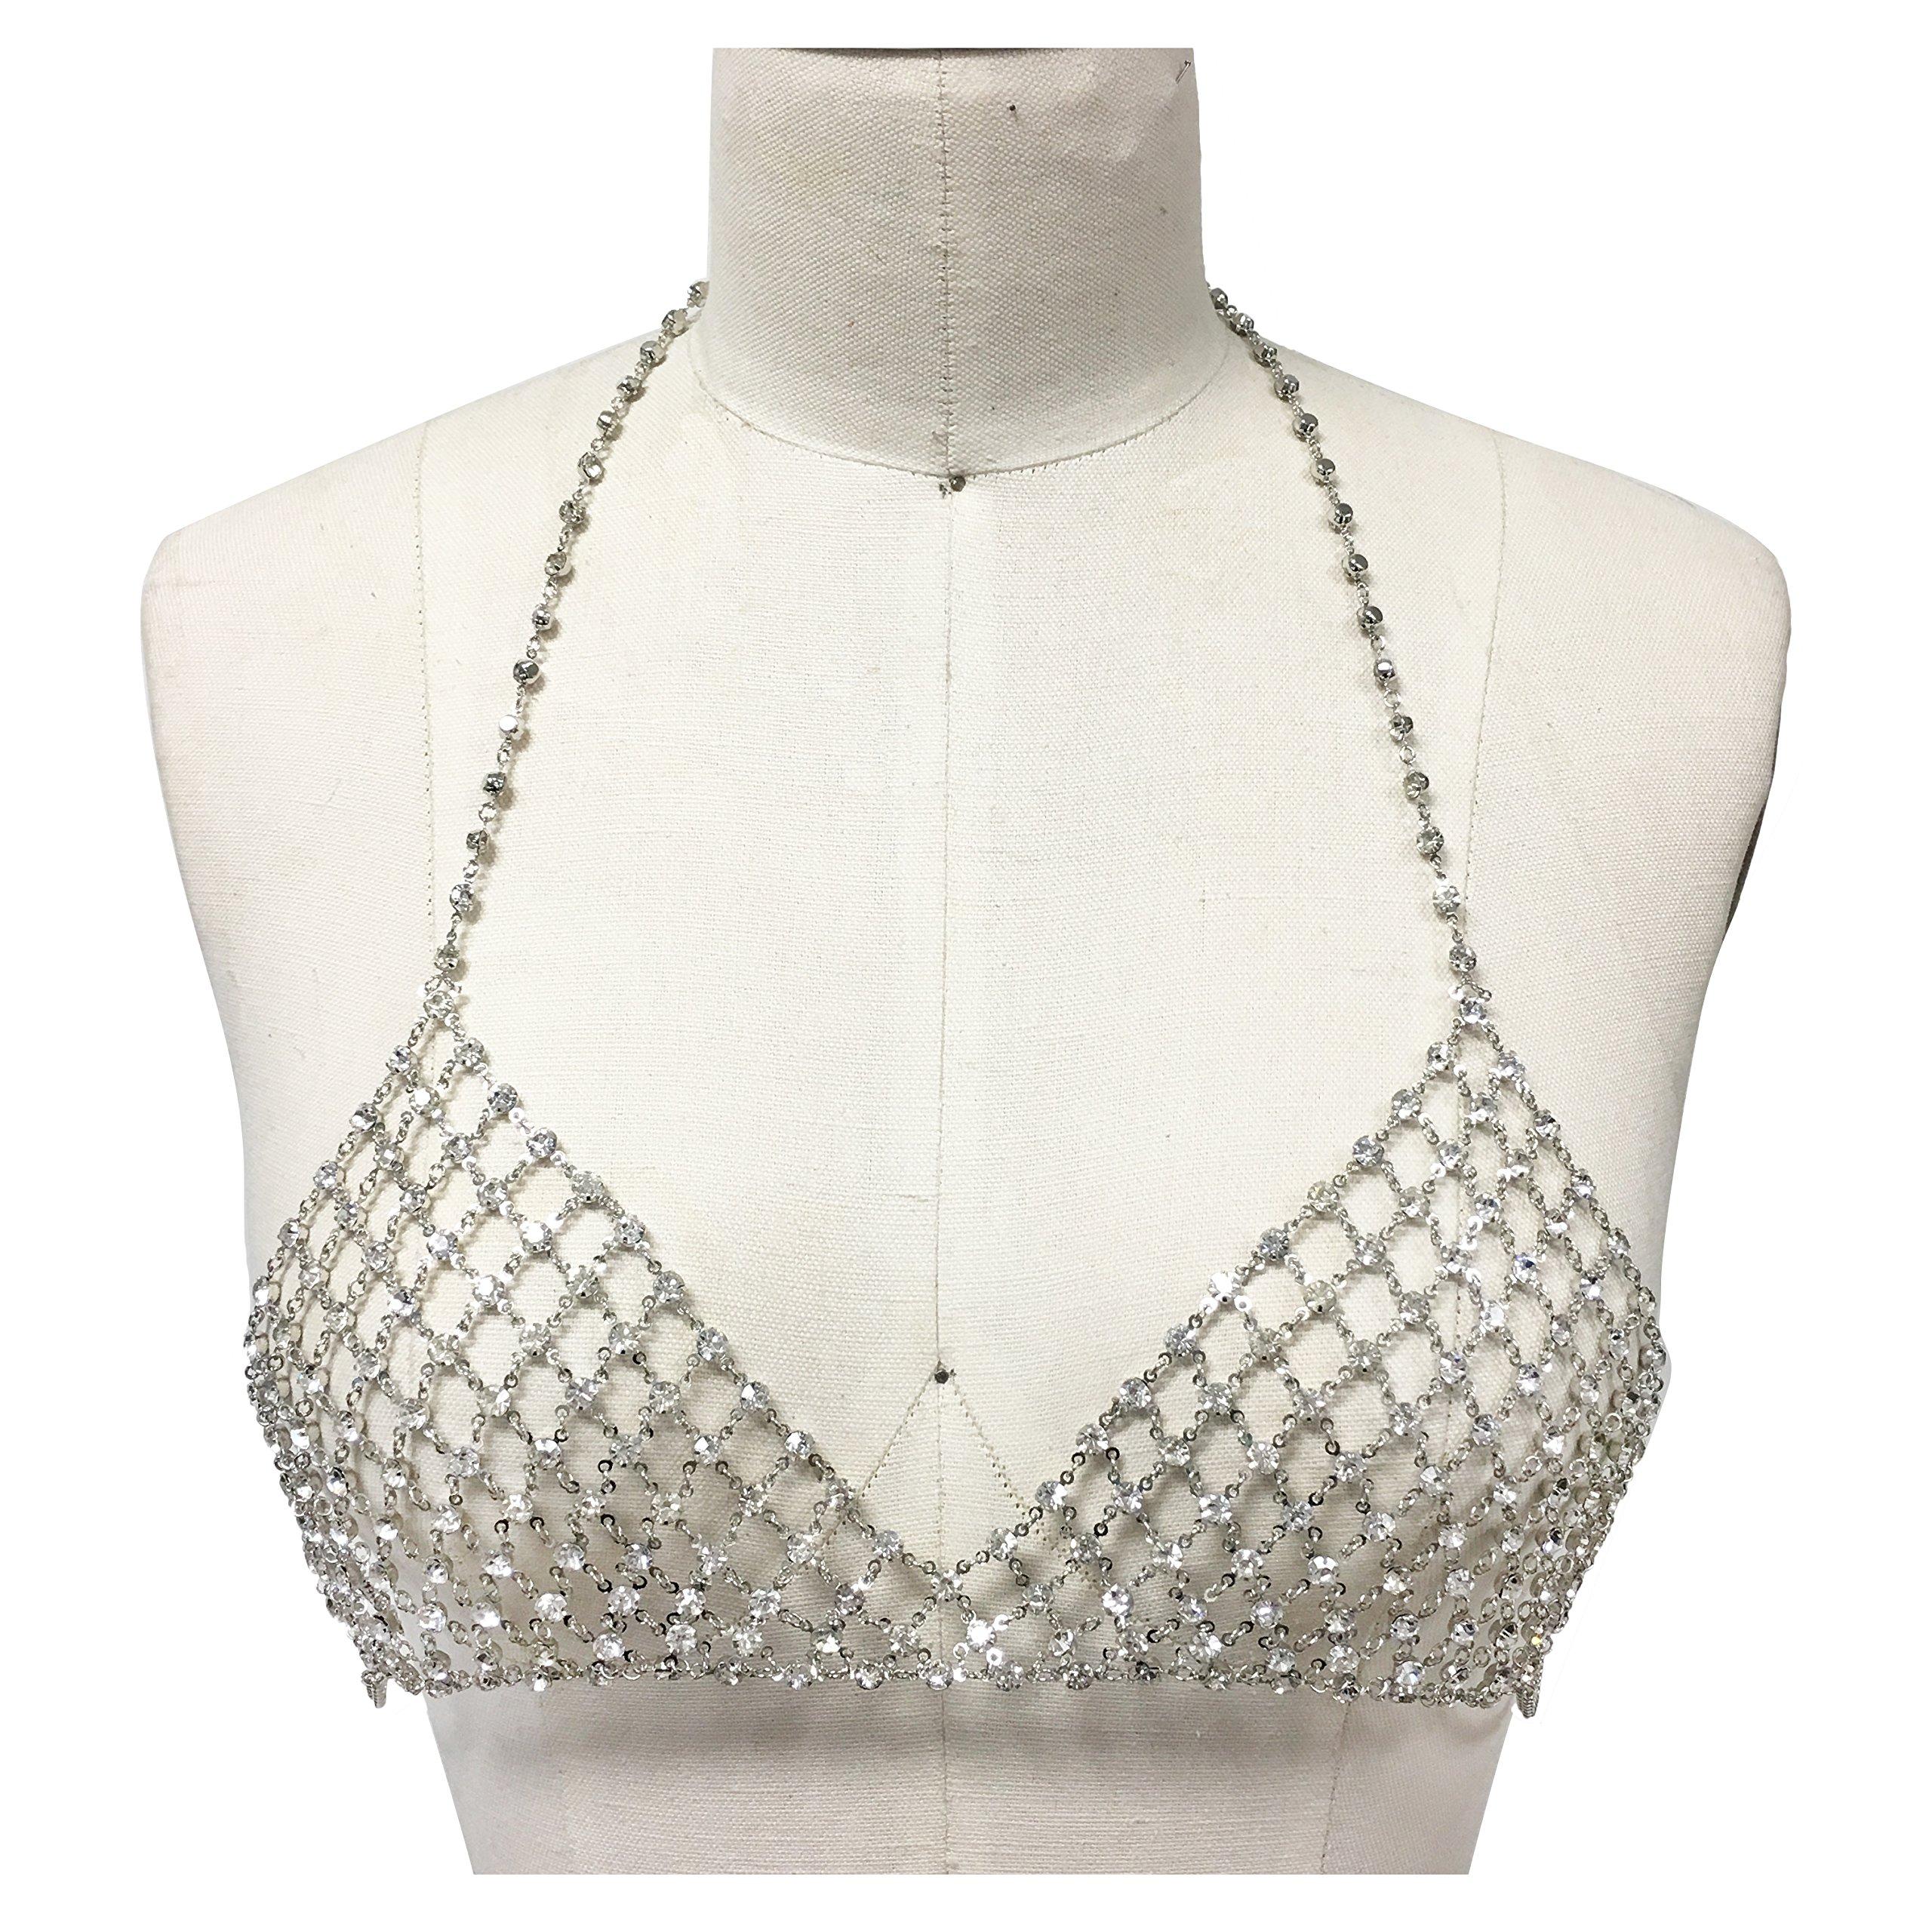 Metal bra rhinestone silver bikini chain bralette